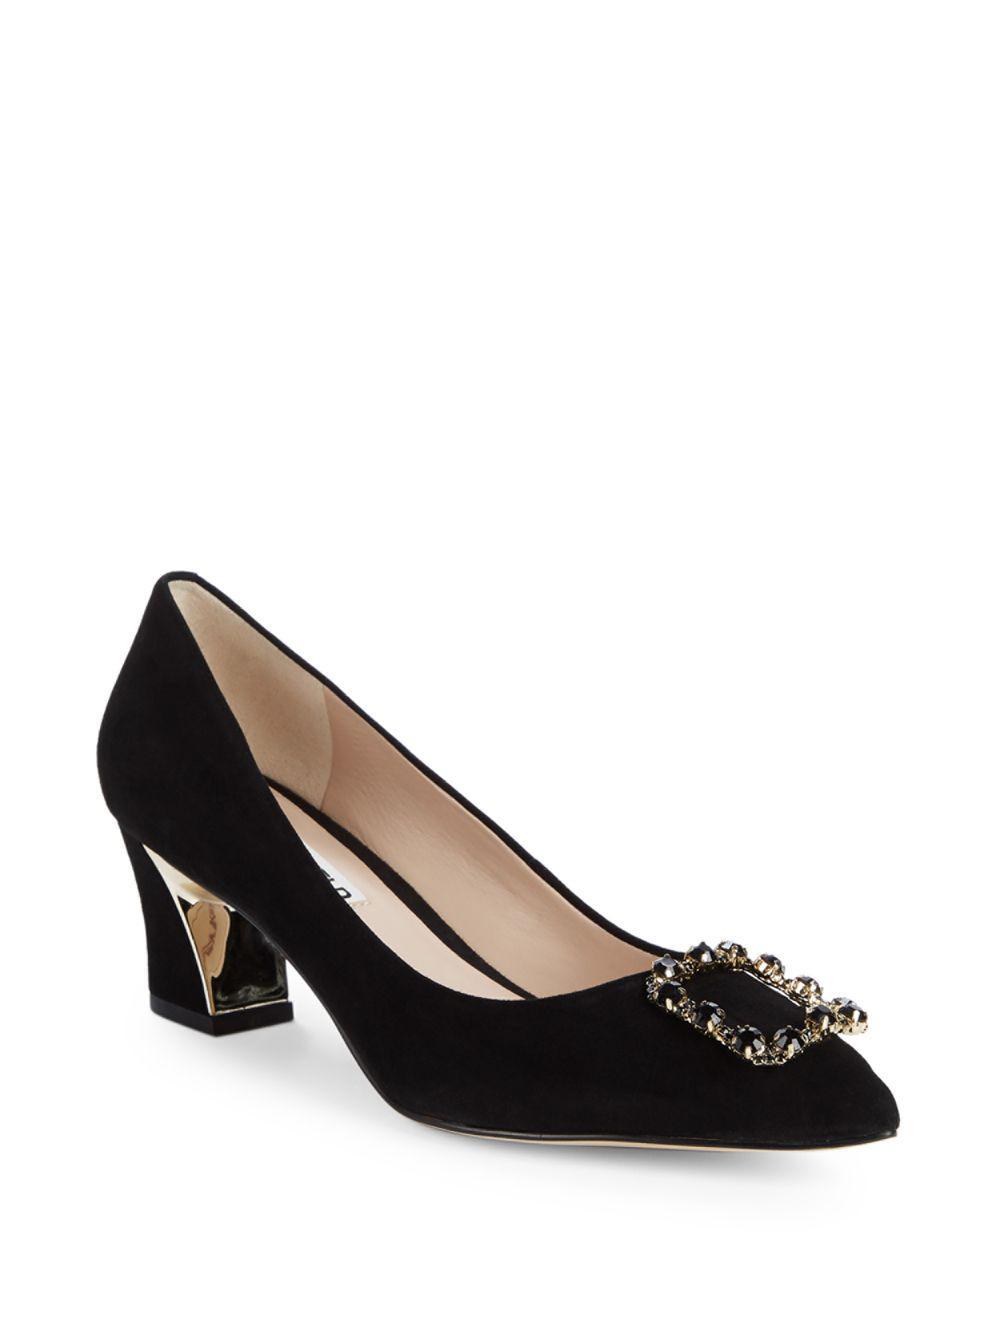 26015b4a043e Karl Lagerfeld Embellished Suede Block Heel Pumps 2